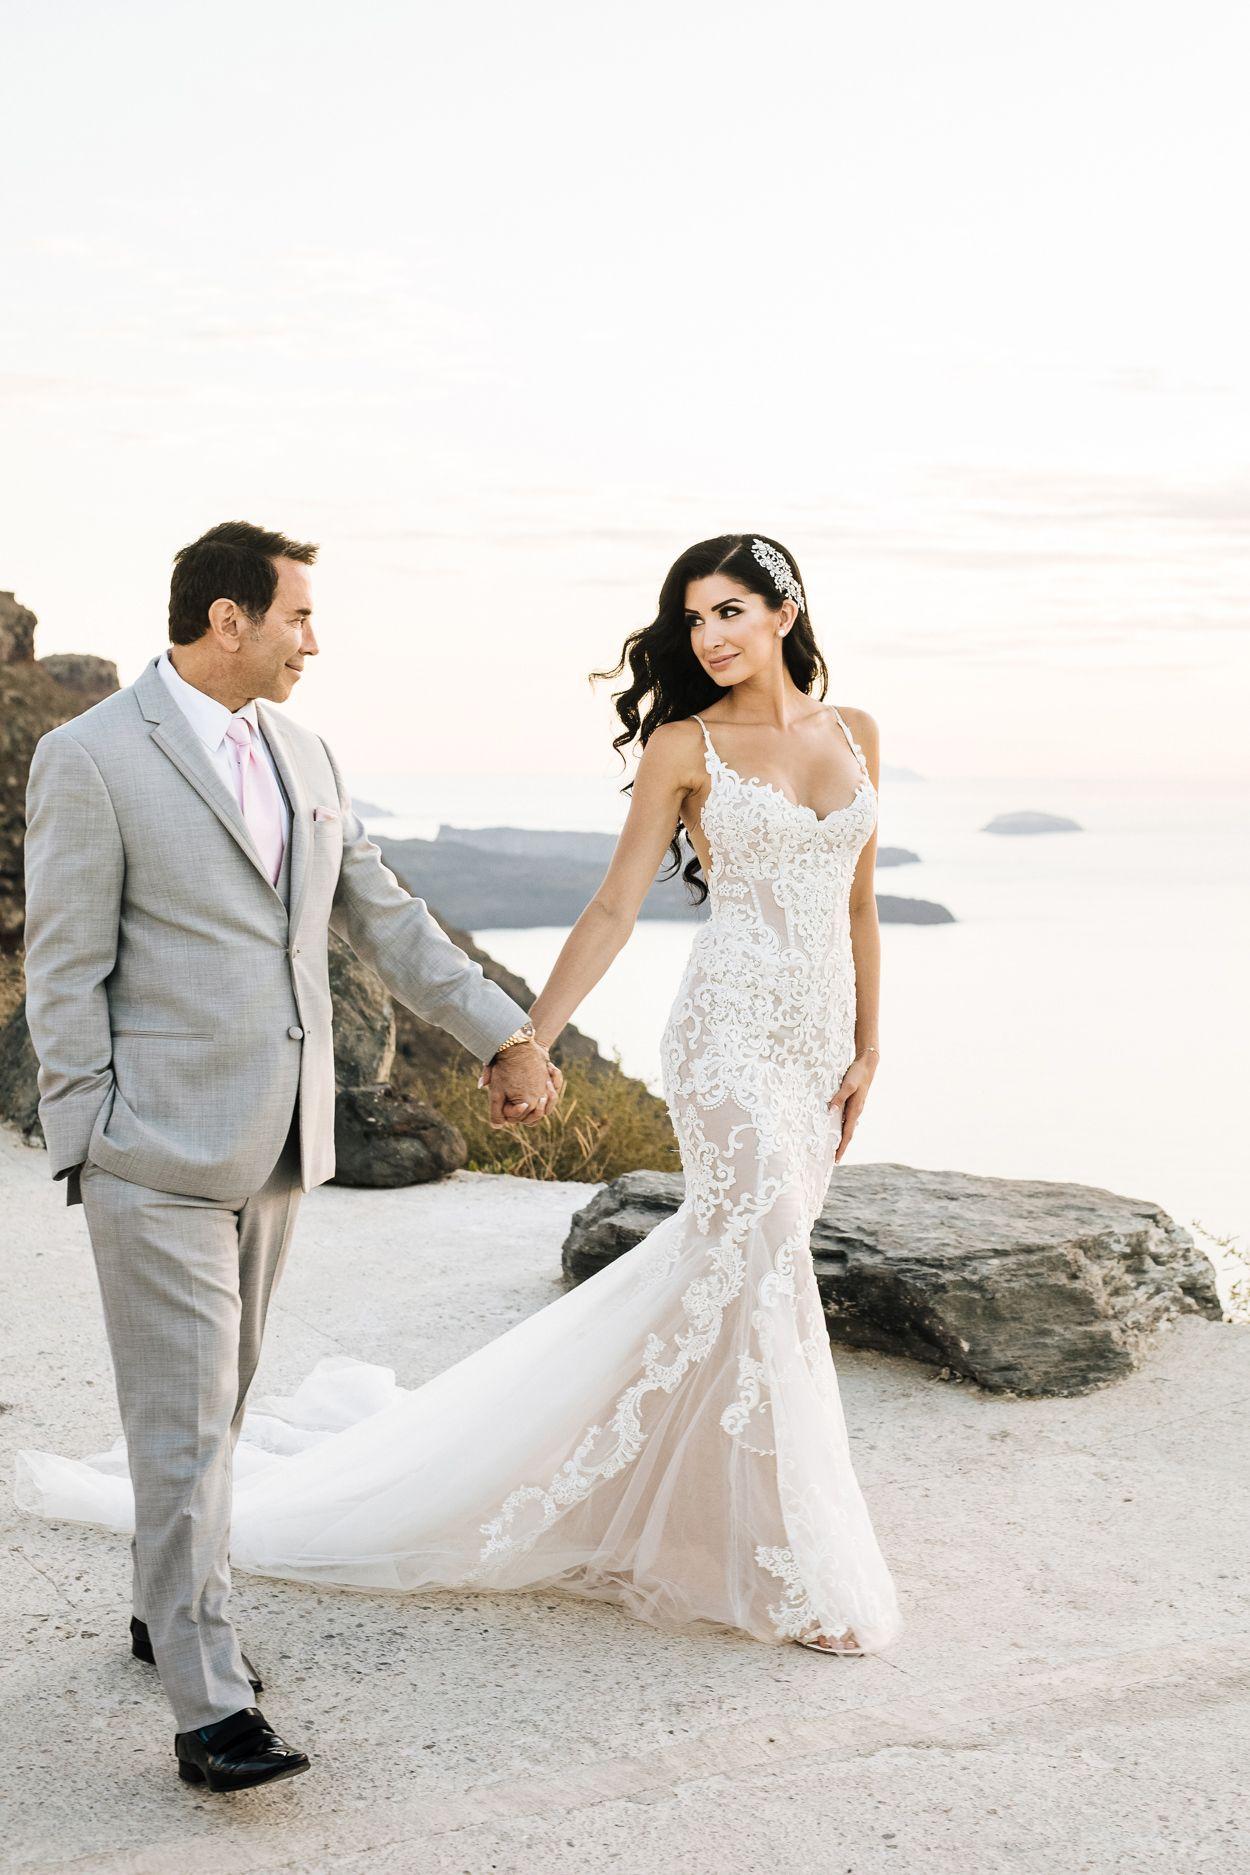 Dr Paul Nassif Amp Brittany Pattakos Wedding Gallery